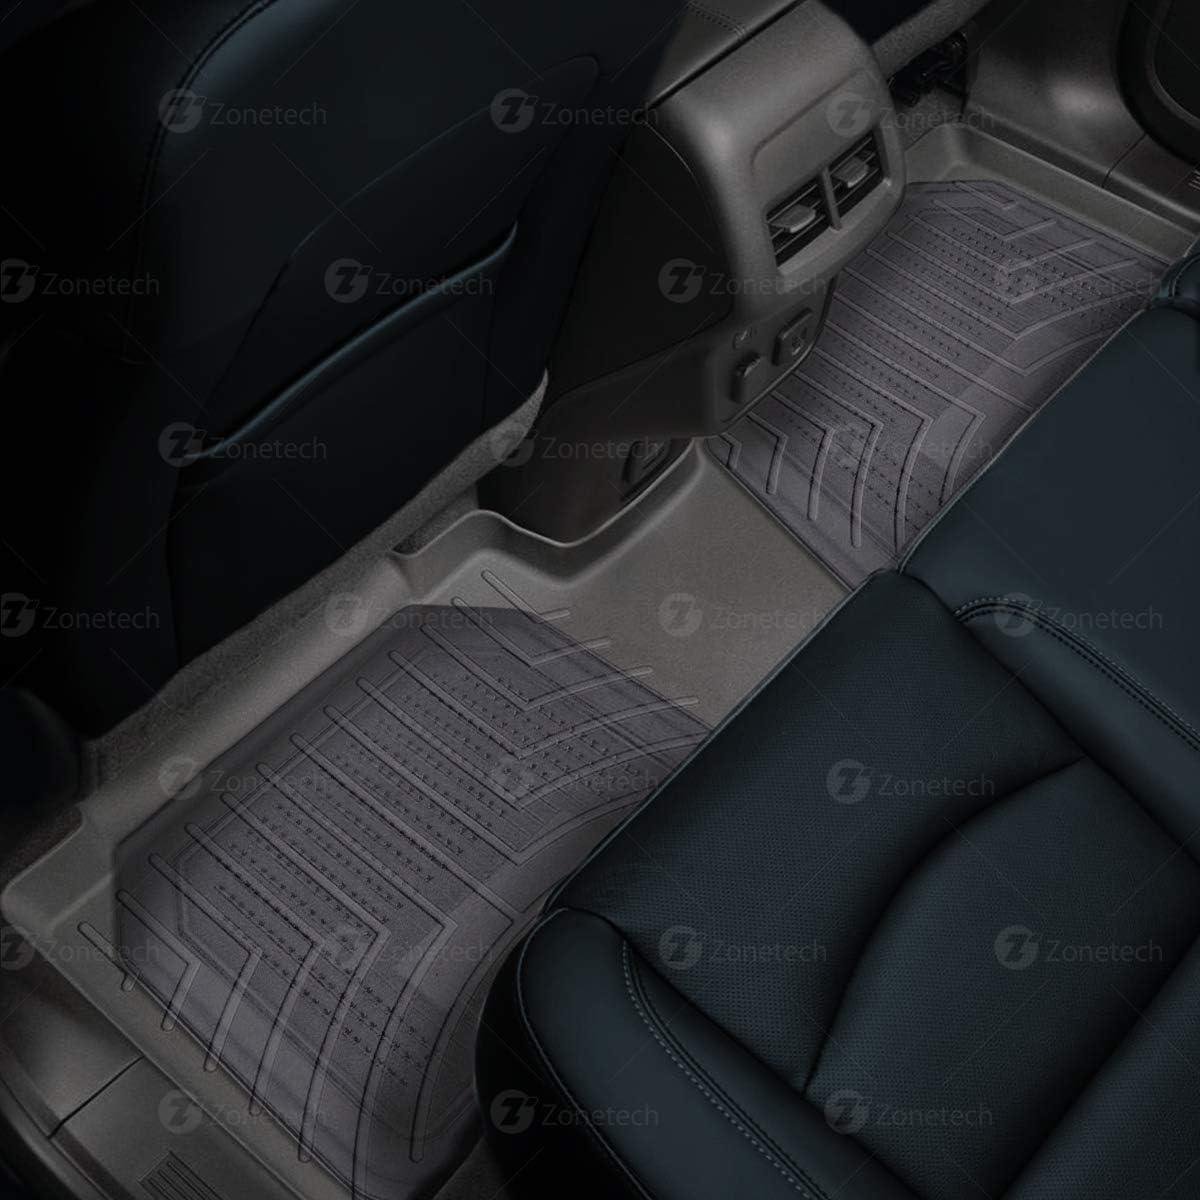 Zone Tech All Weather Full Rubber Clear Car Interior Floor Mats 4-Piece Set Clear Heavy Duty Car Interior Floor Mats